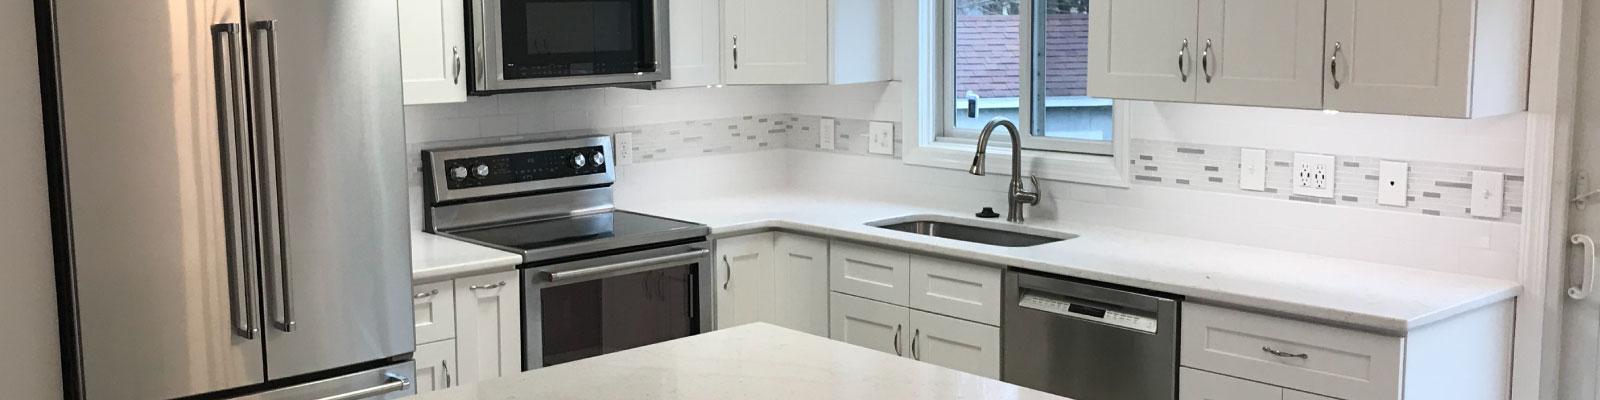 kitchen remodeling 3 day kitchen bath rh 3daykitchen com 3 day kitchen and bath cincinnati 3 day kitchen and bath bbb